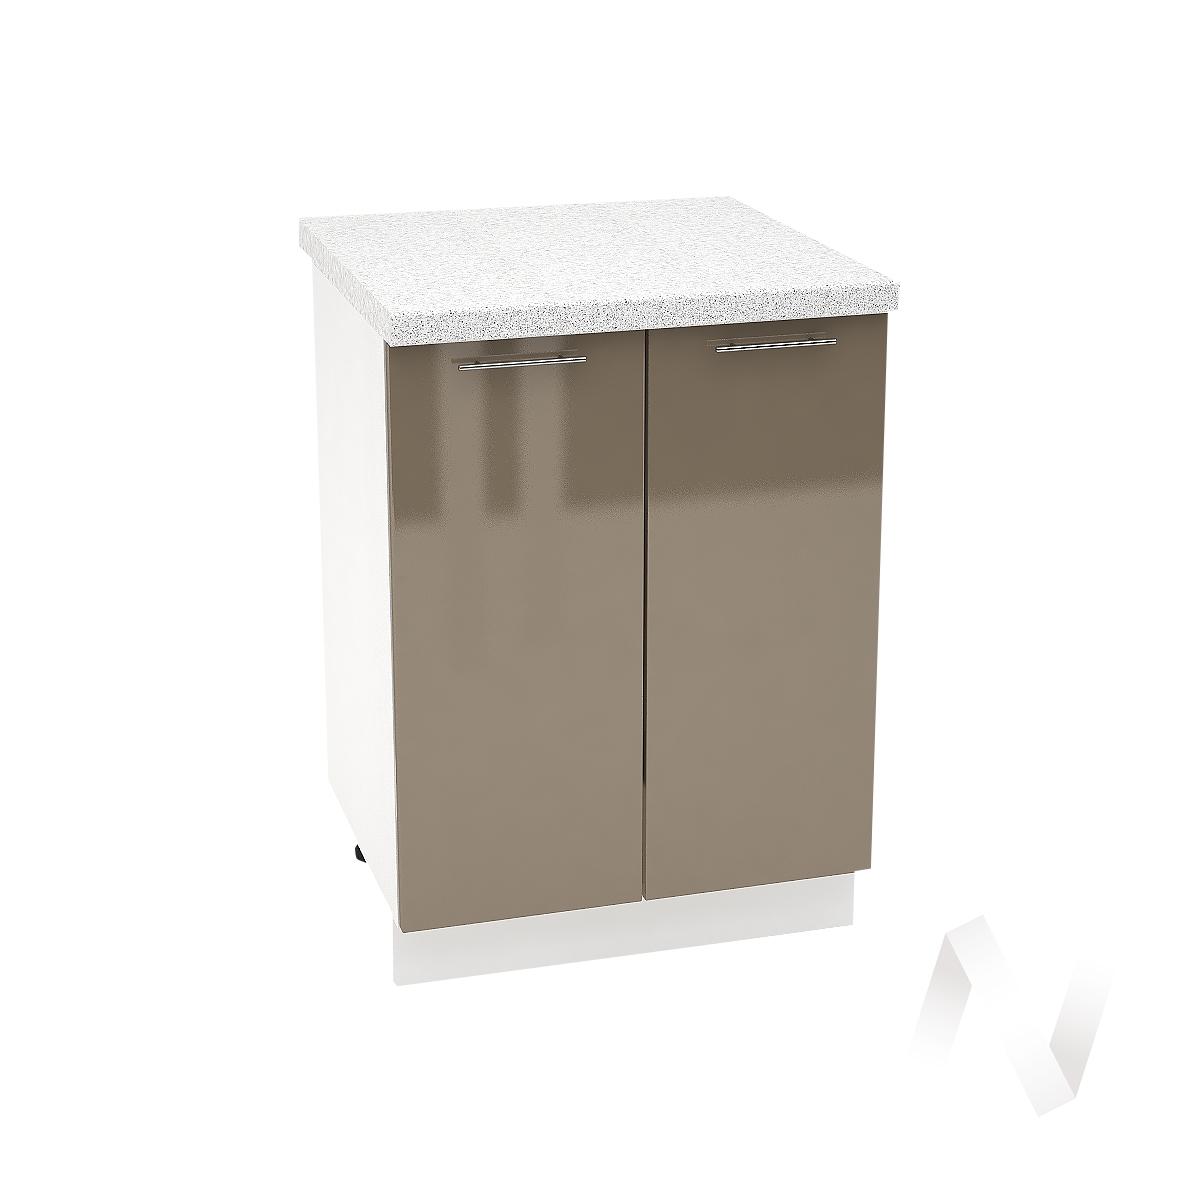 "Кухня ""Валерия-М"": Шкаф нижний 600, ШН 600 (Капучино глянец/корпус белый)"